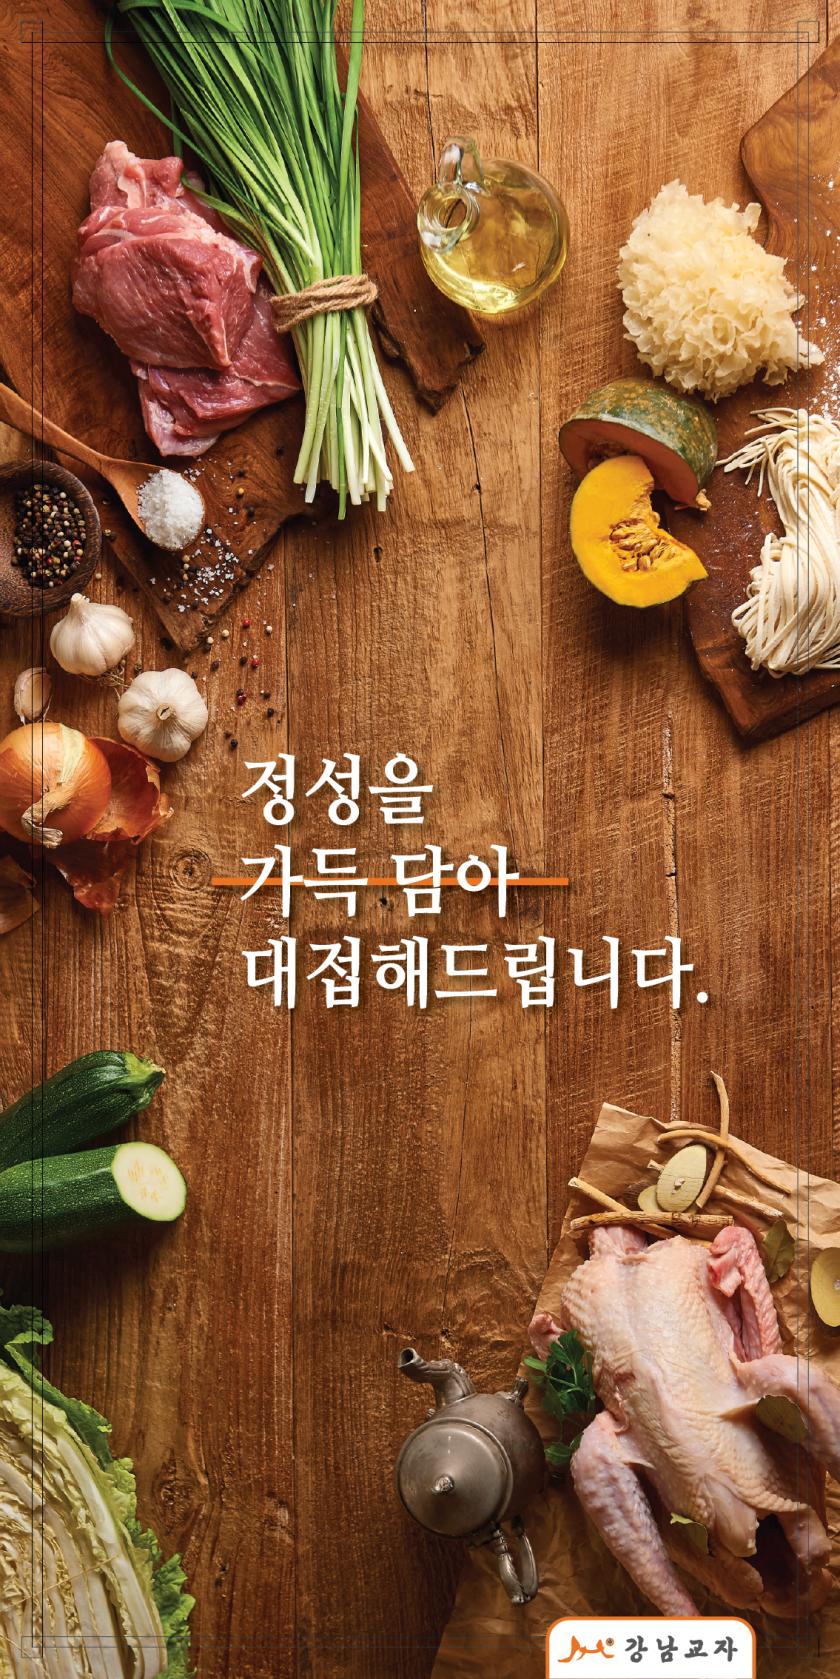 Poster_Menu_Service